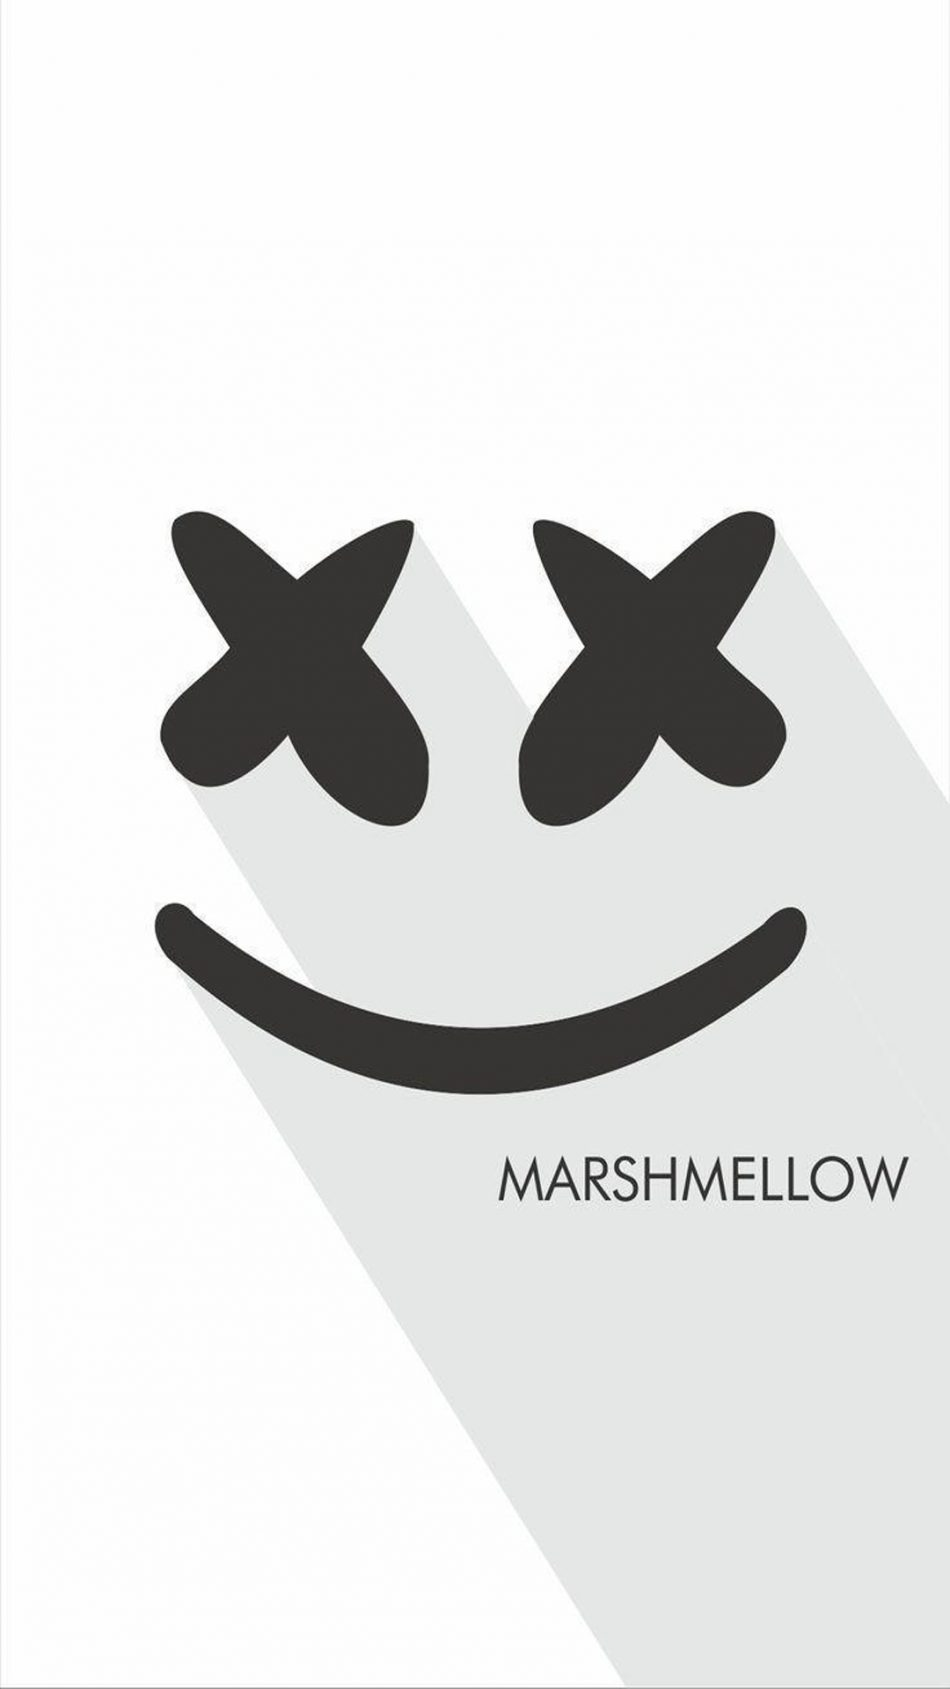 Dj Marshmello Logo Hd Mobile Wallpaper